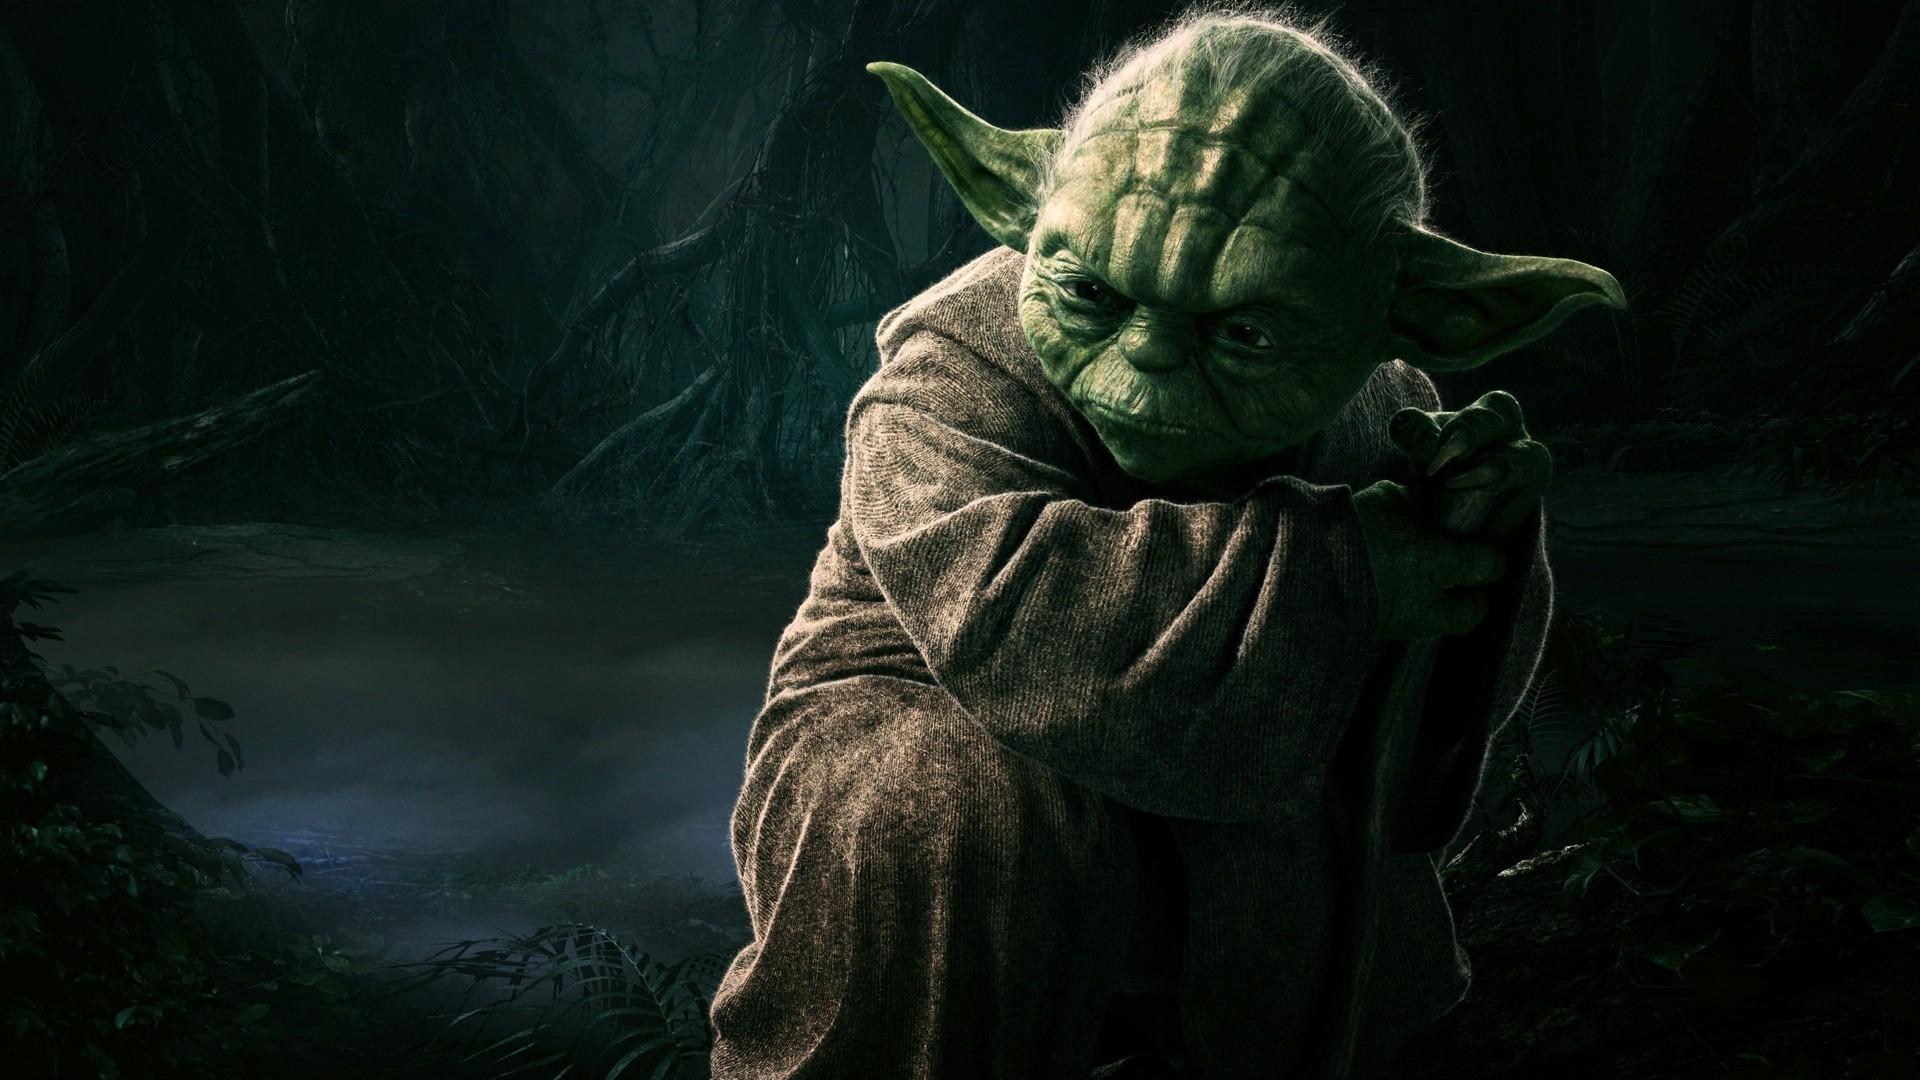 Wallpaper Star Wars Artwork Jedi Yoda Mythology Dagobah Darkness Screenshot Computer Wallpaper Fictional Character Special Effects 1920x1080 Pvris 262802 Hd Wallpapers Wallhere